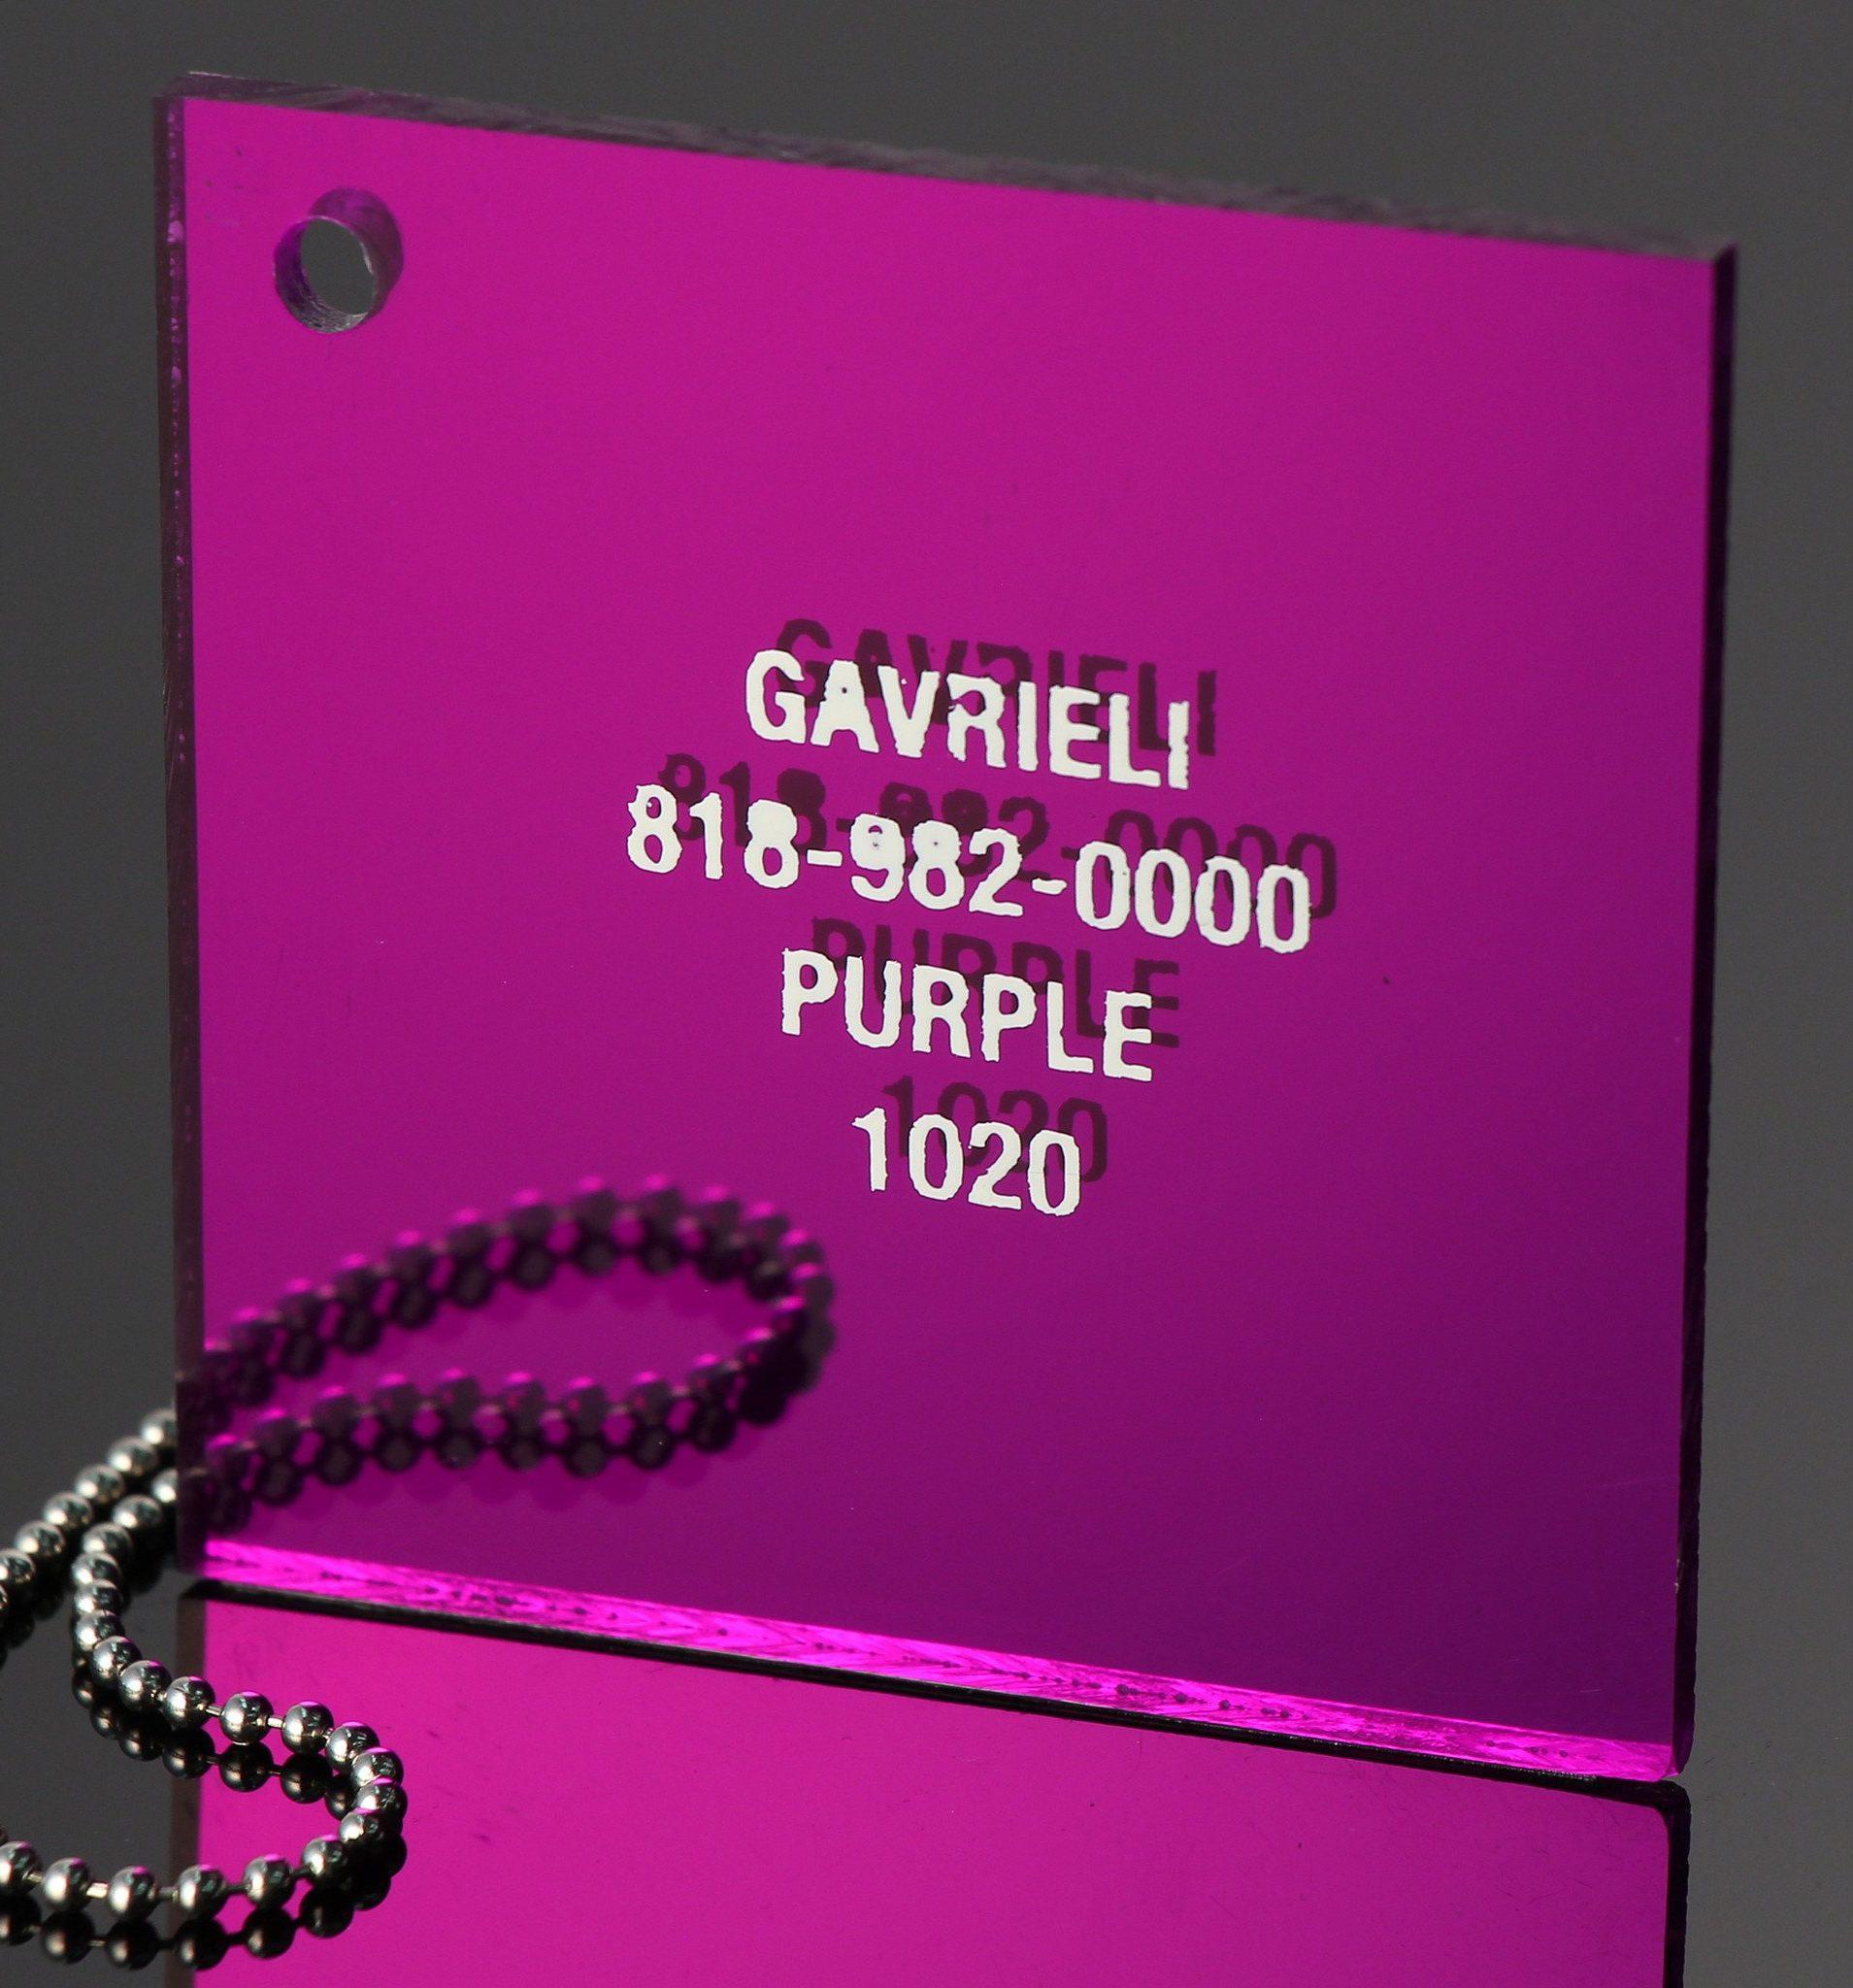 PURPLE 1020